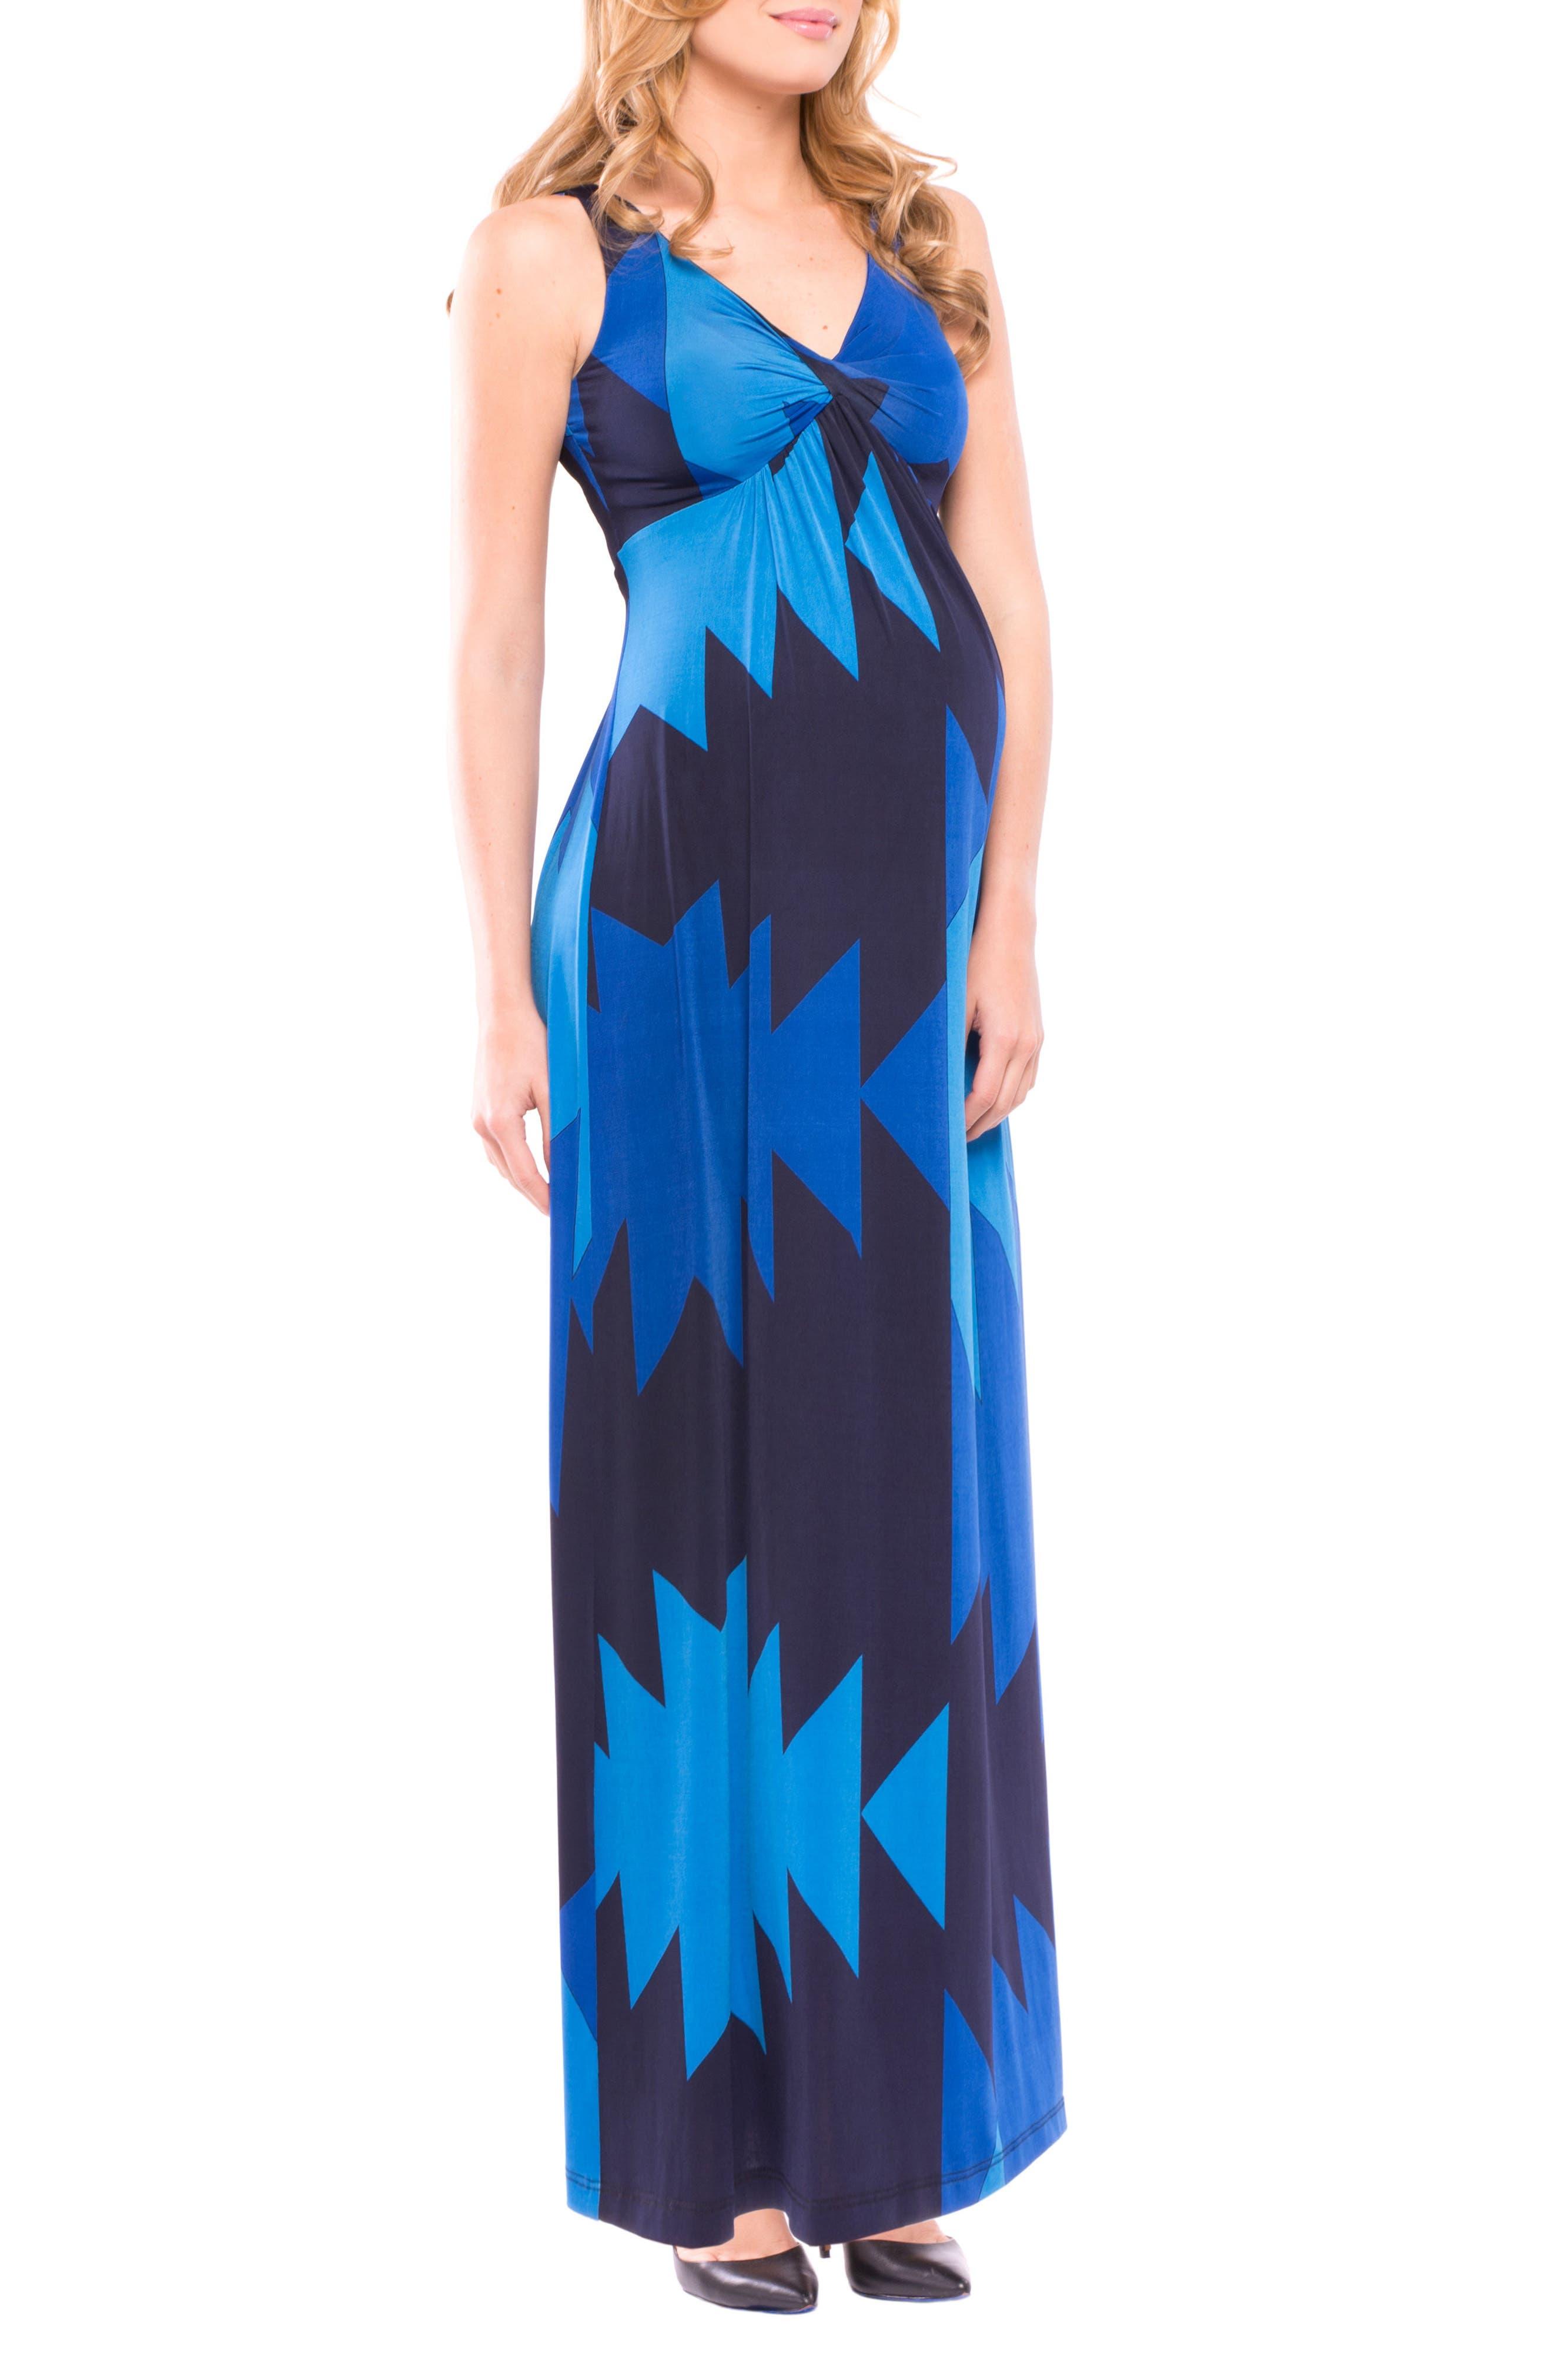 Olivia Sleeveless Maternity Maxi Dress,                             Alternate thumbnail 4, color,                             BLUE AZTEC PRINT